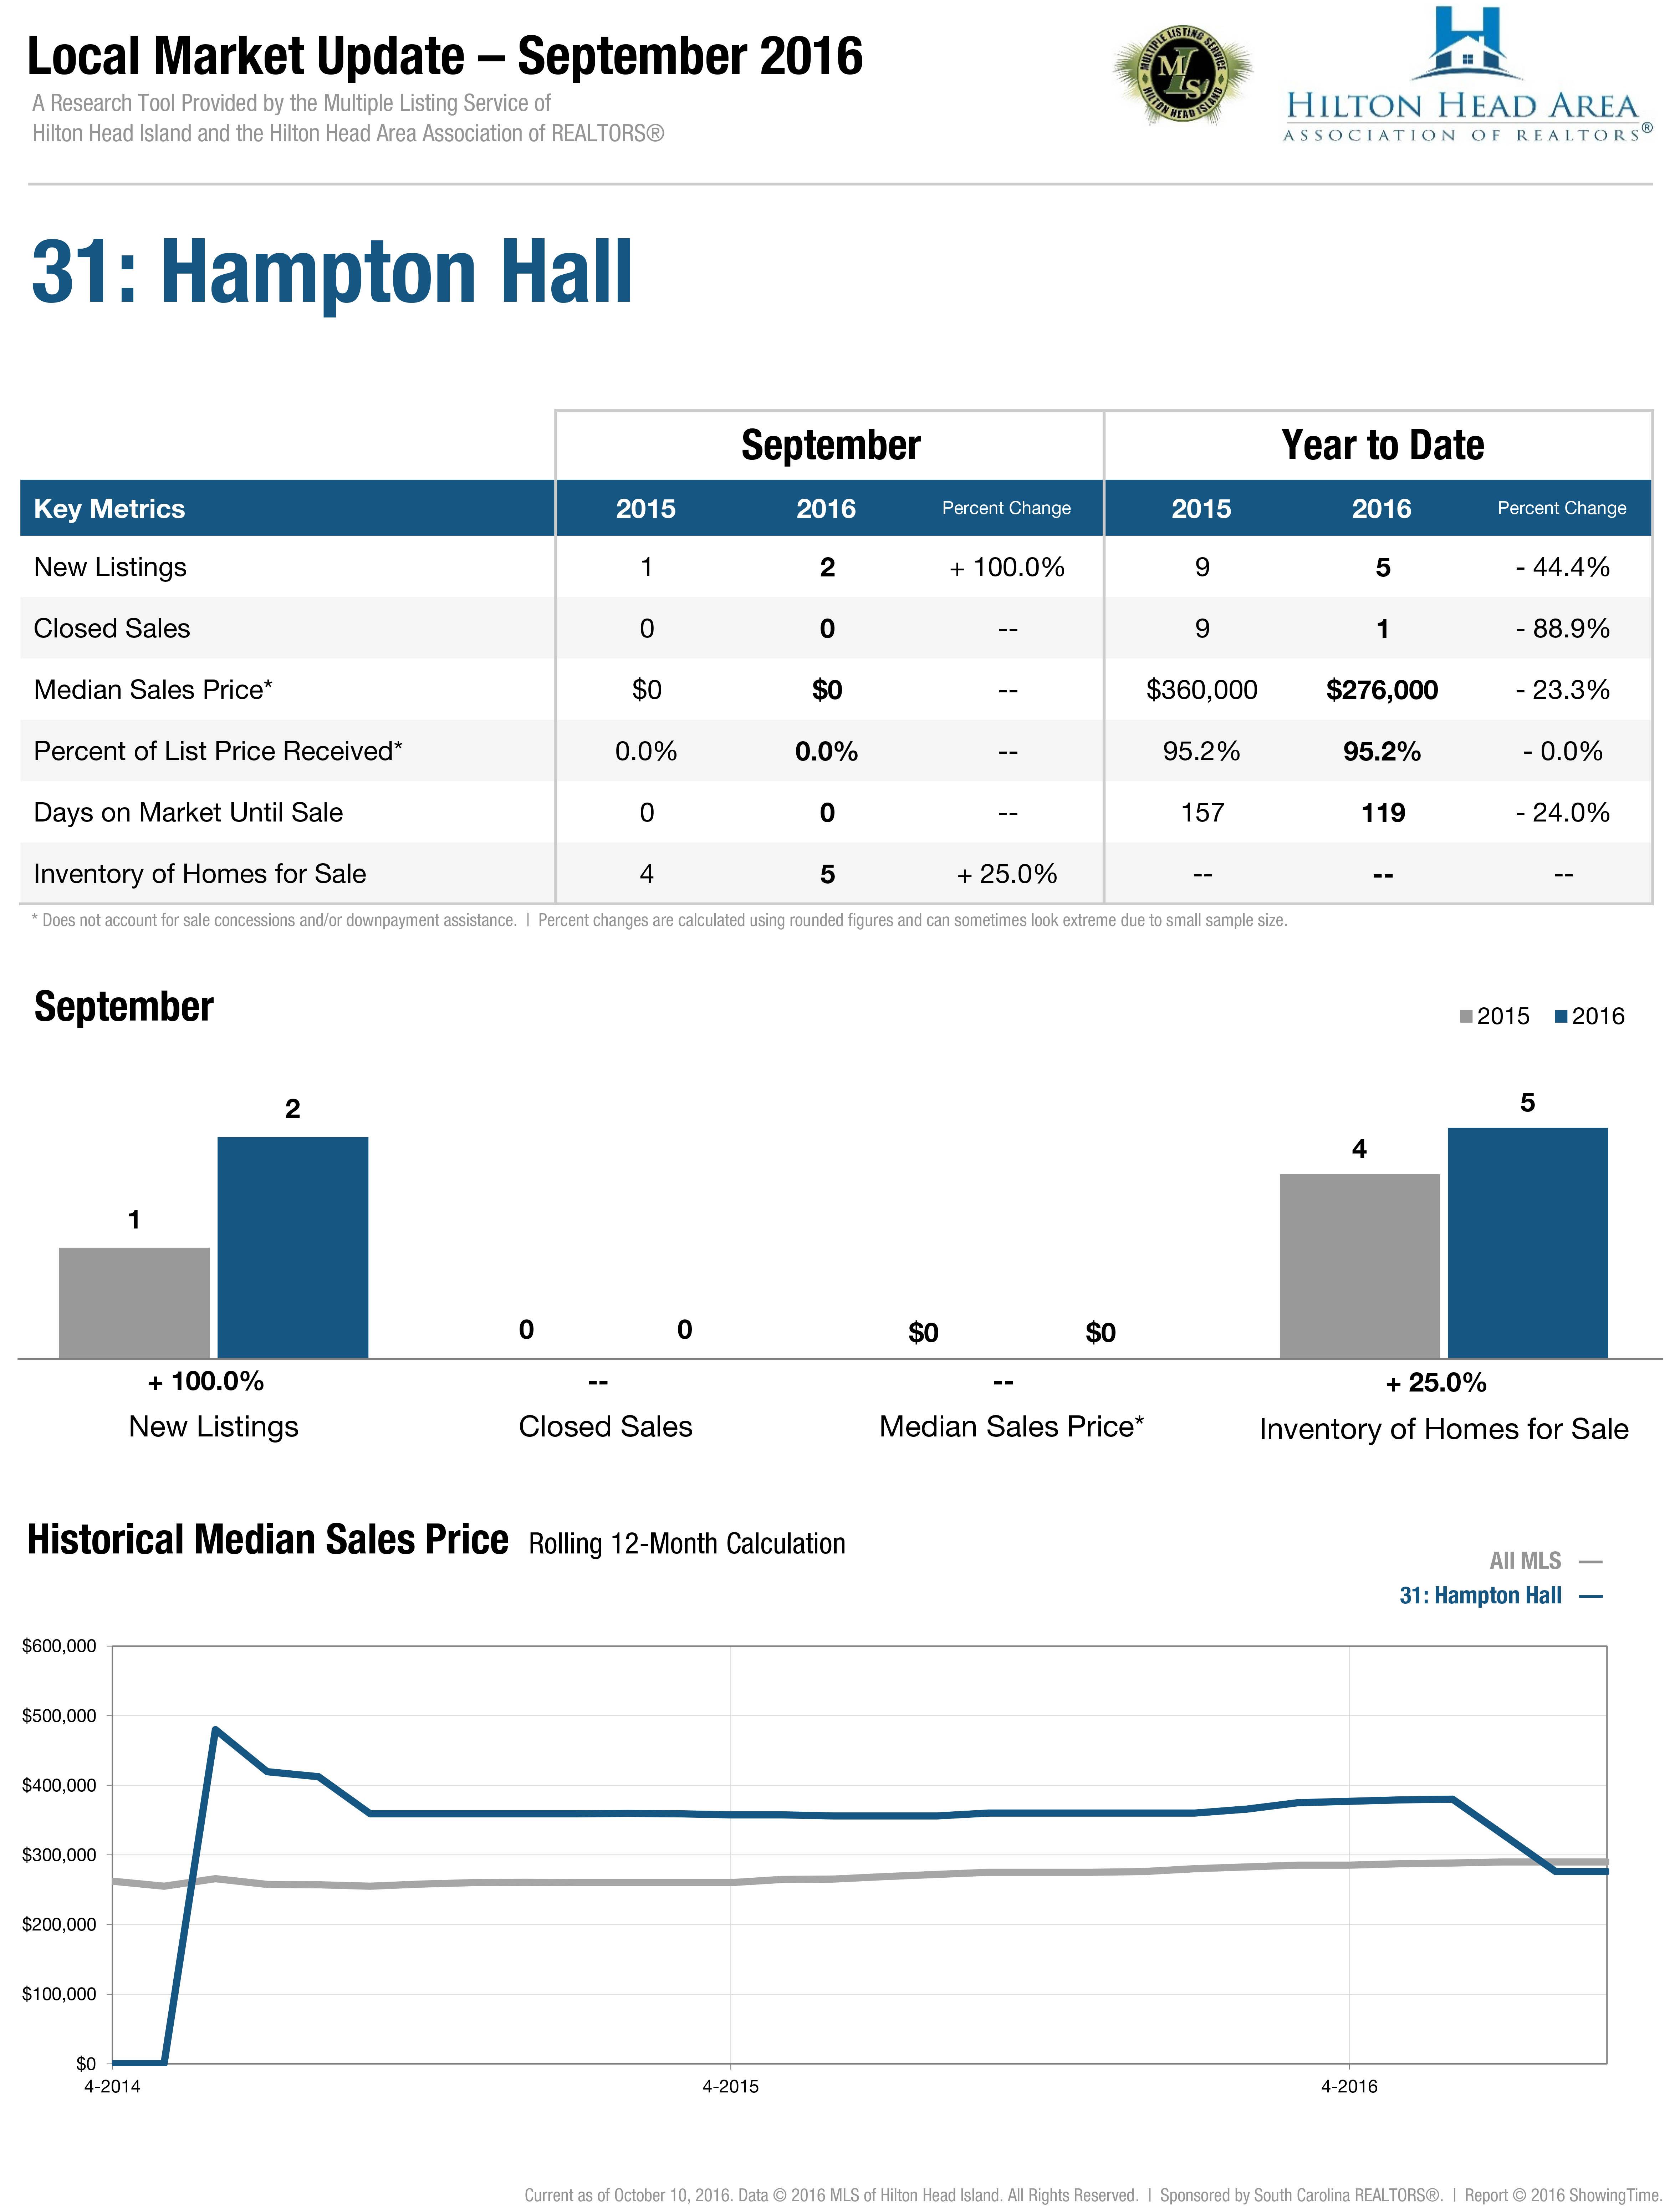 31: Hampton Hall